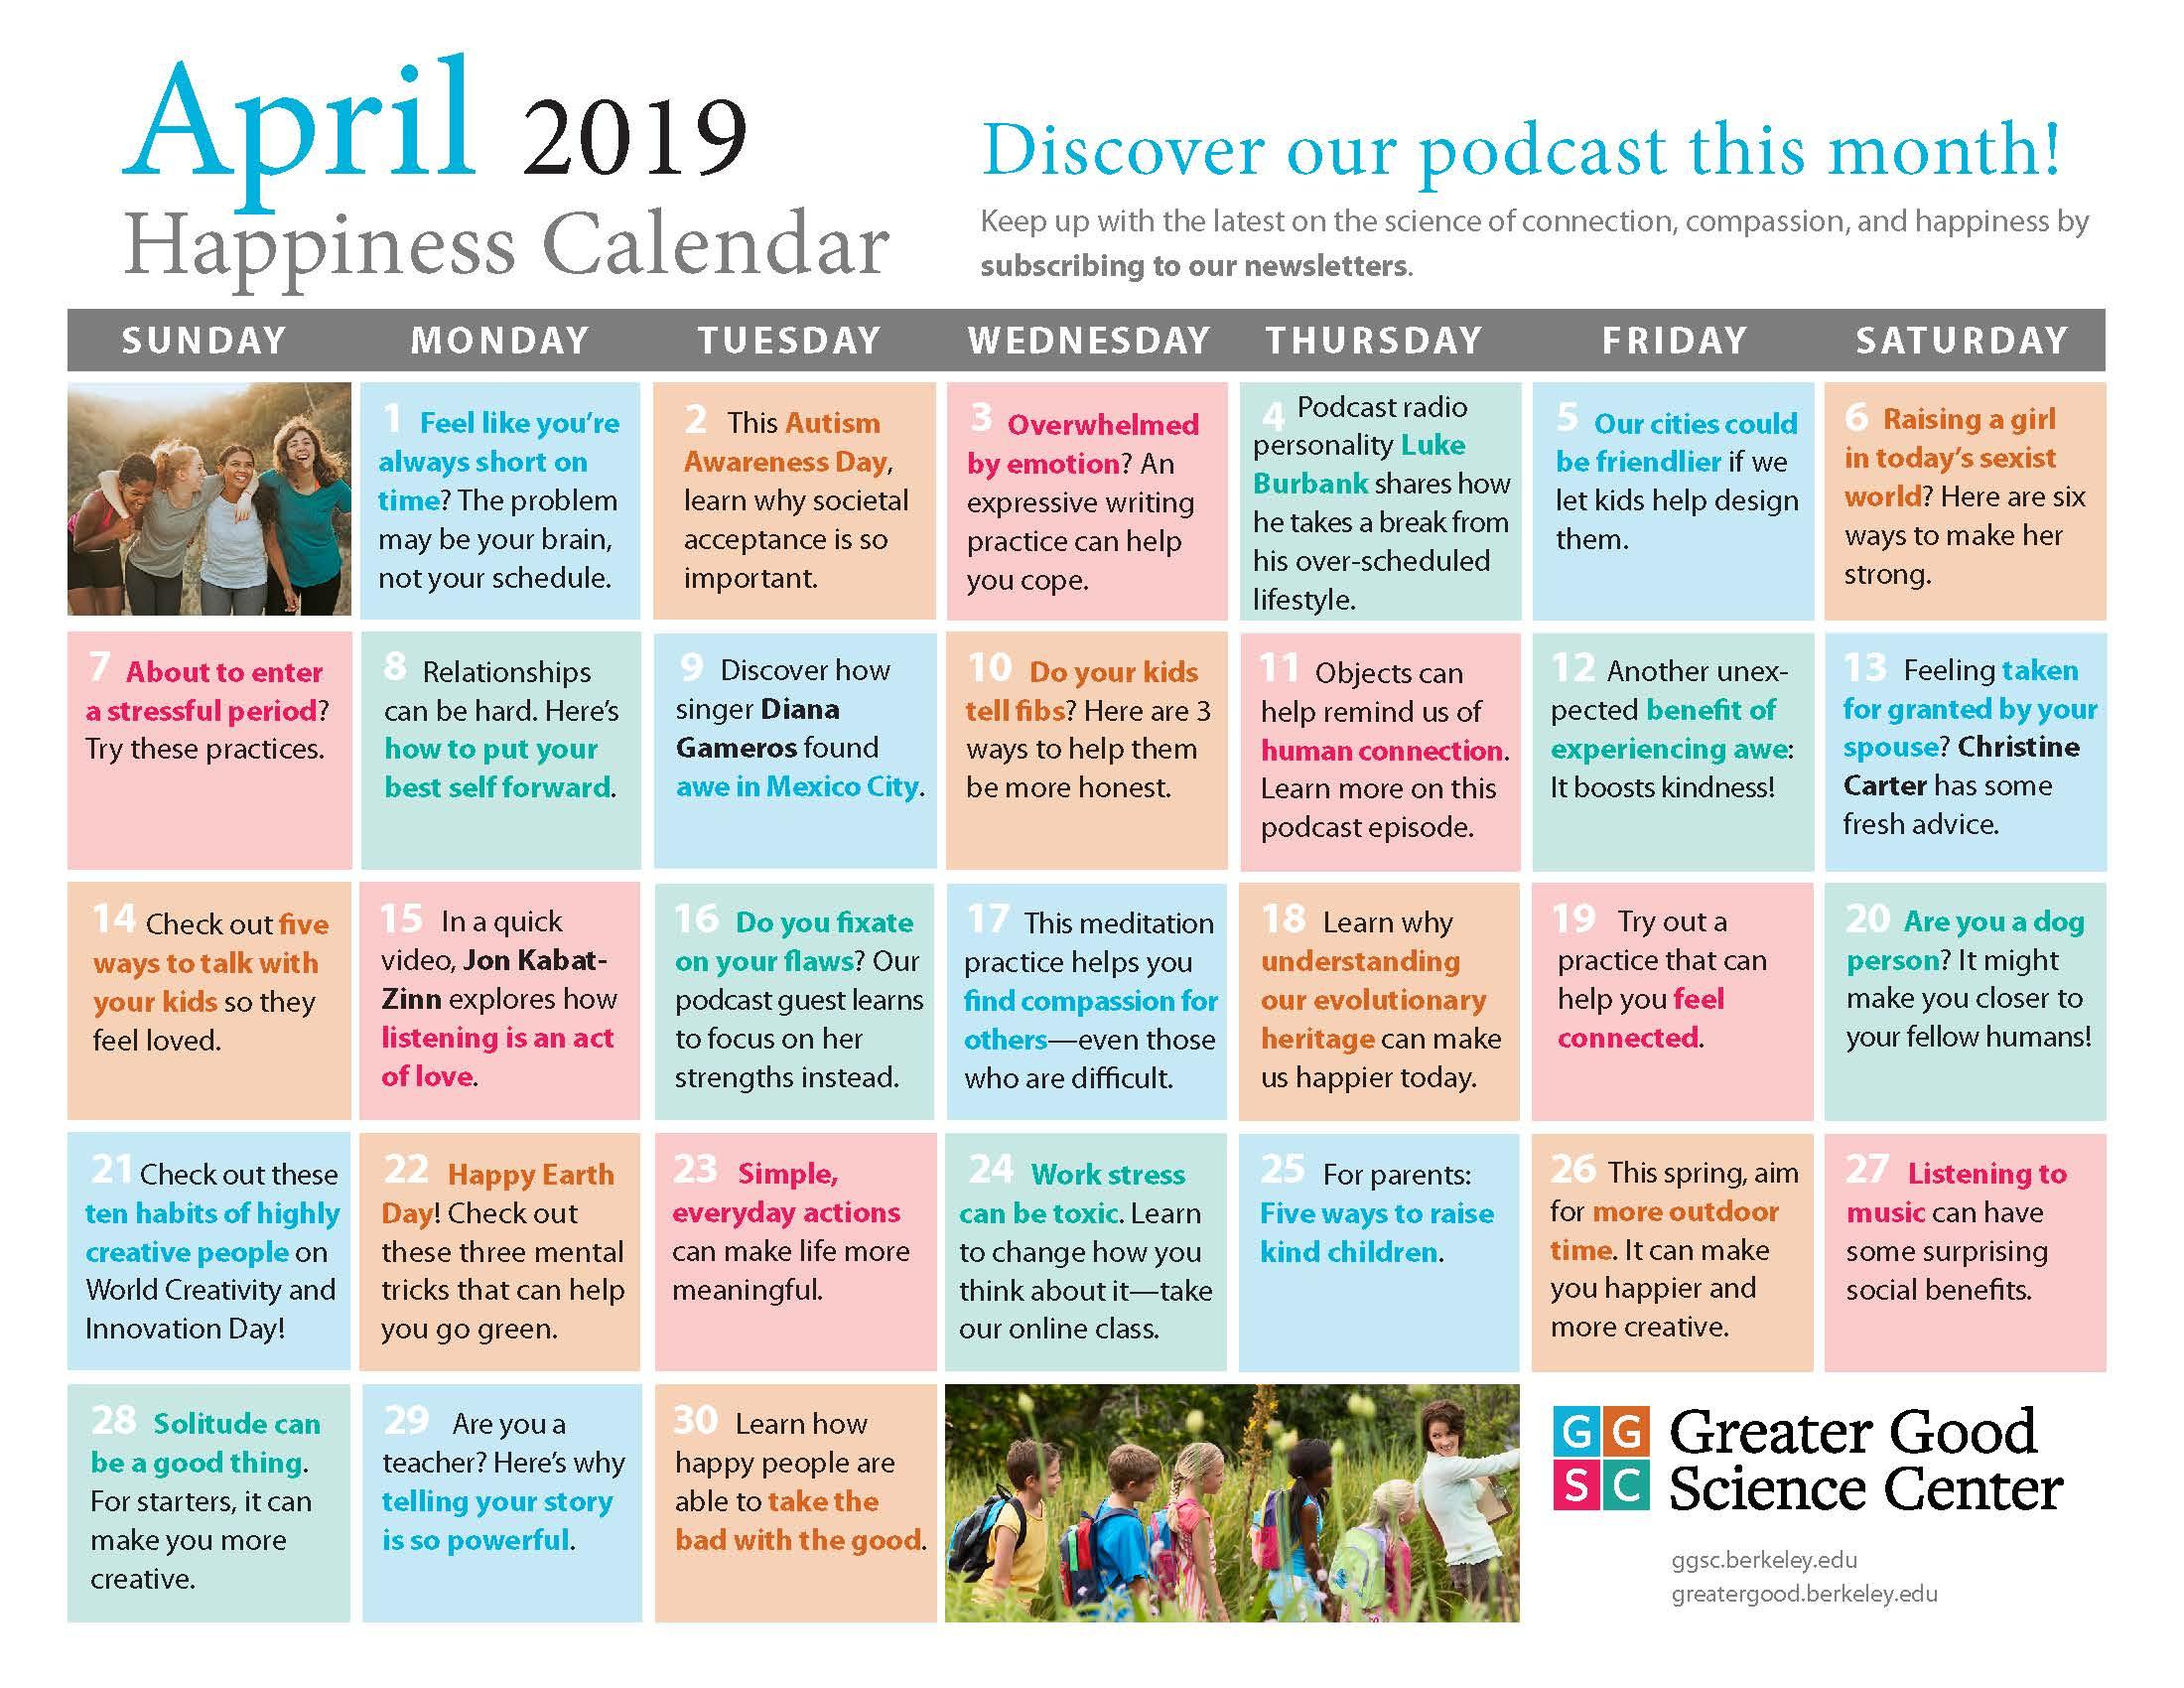 April 2019 Happiness Calendar